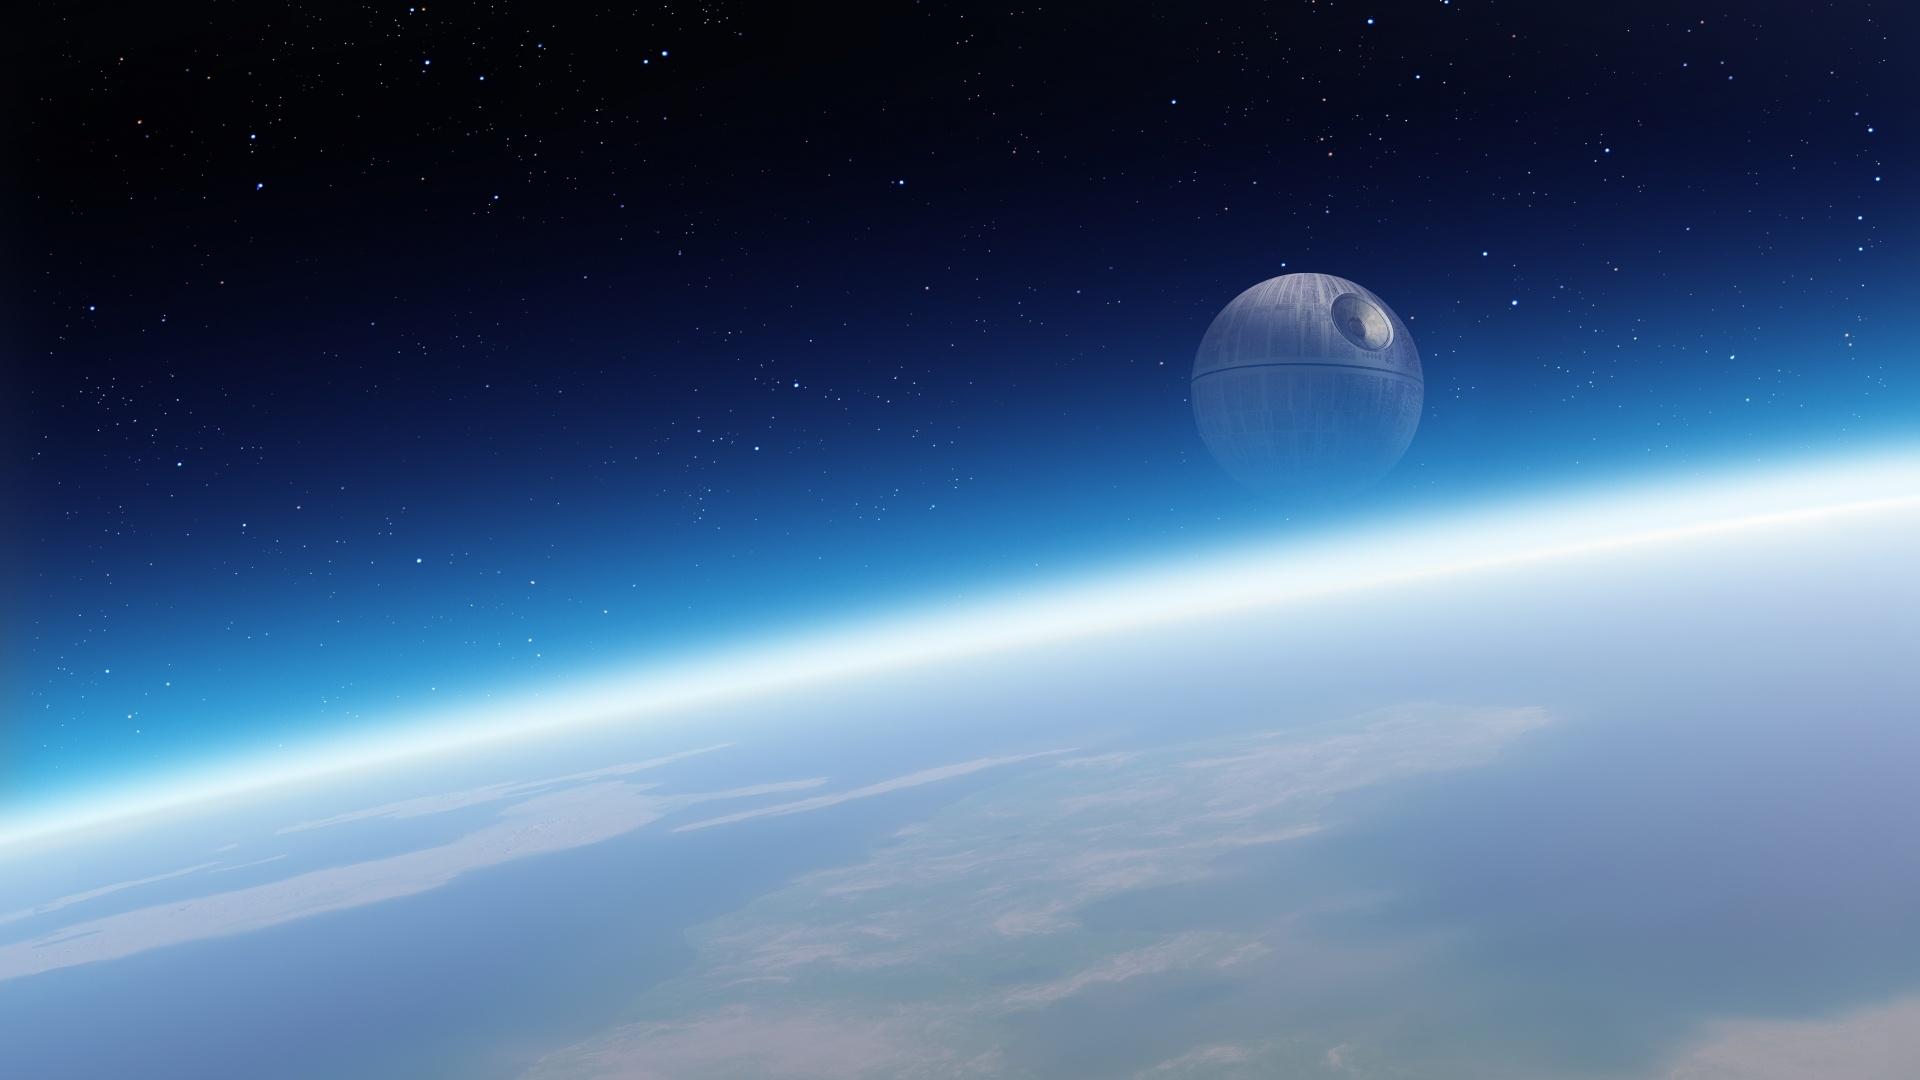 Death Star desktop wallpaper free download